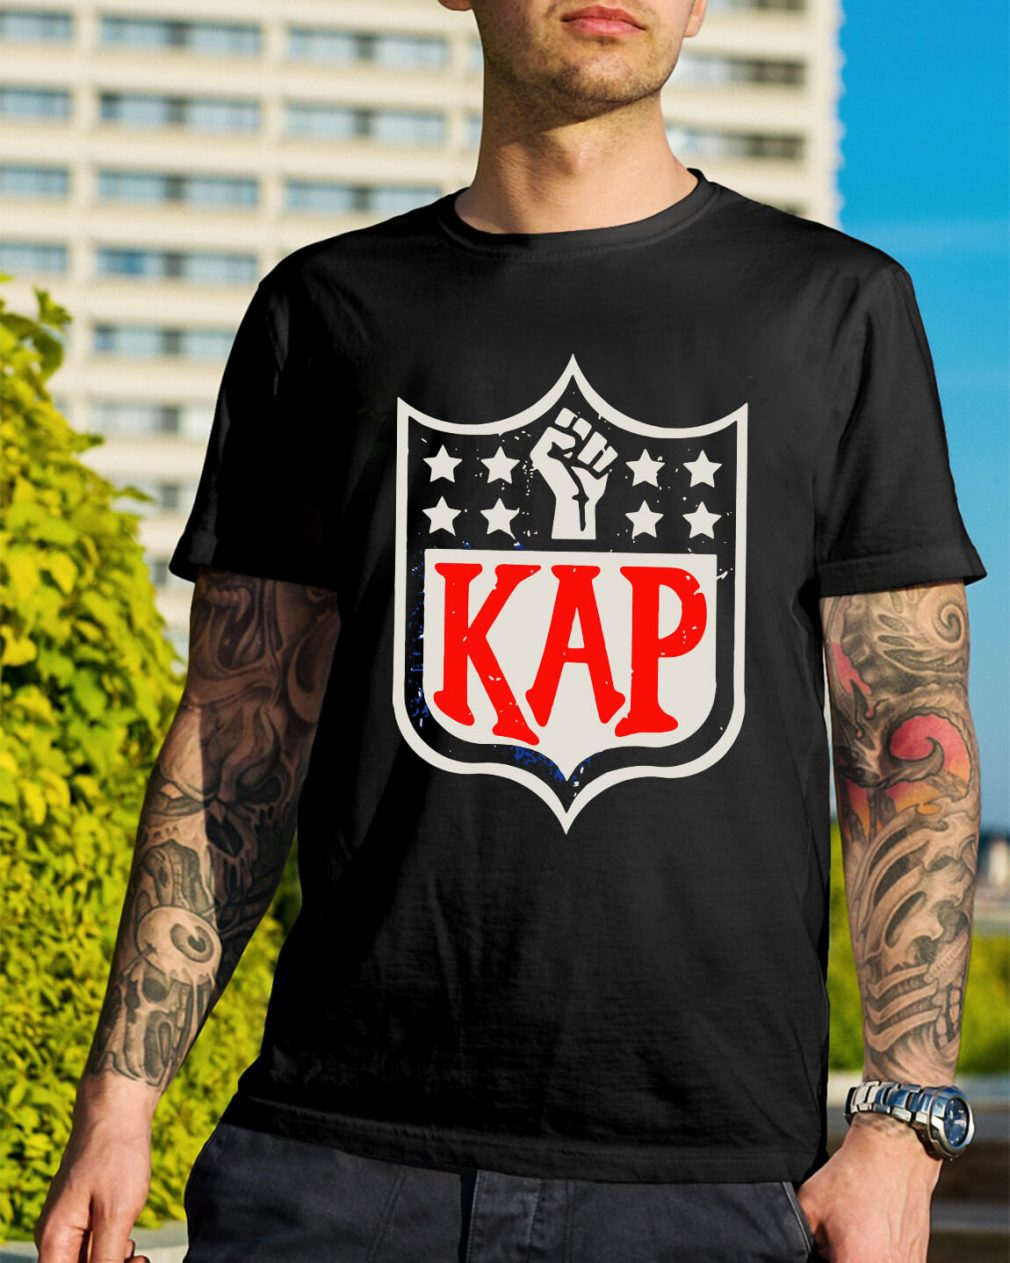 Official Colin Kaepernick Kap NFL shield shirt